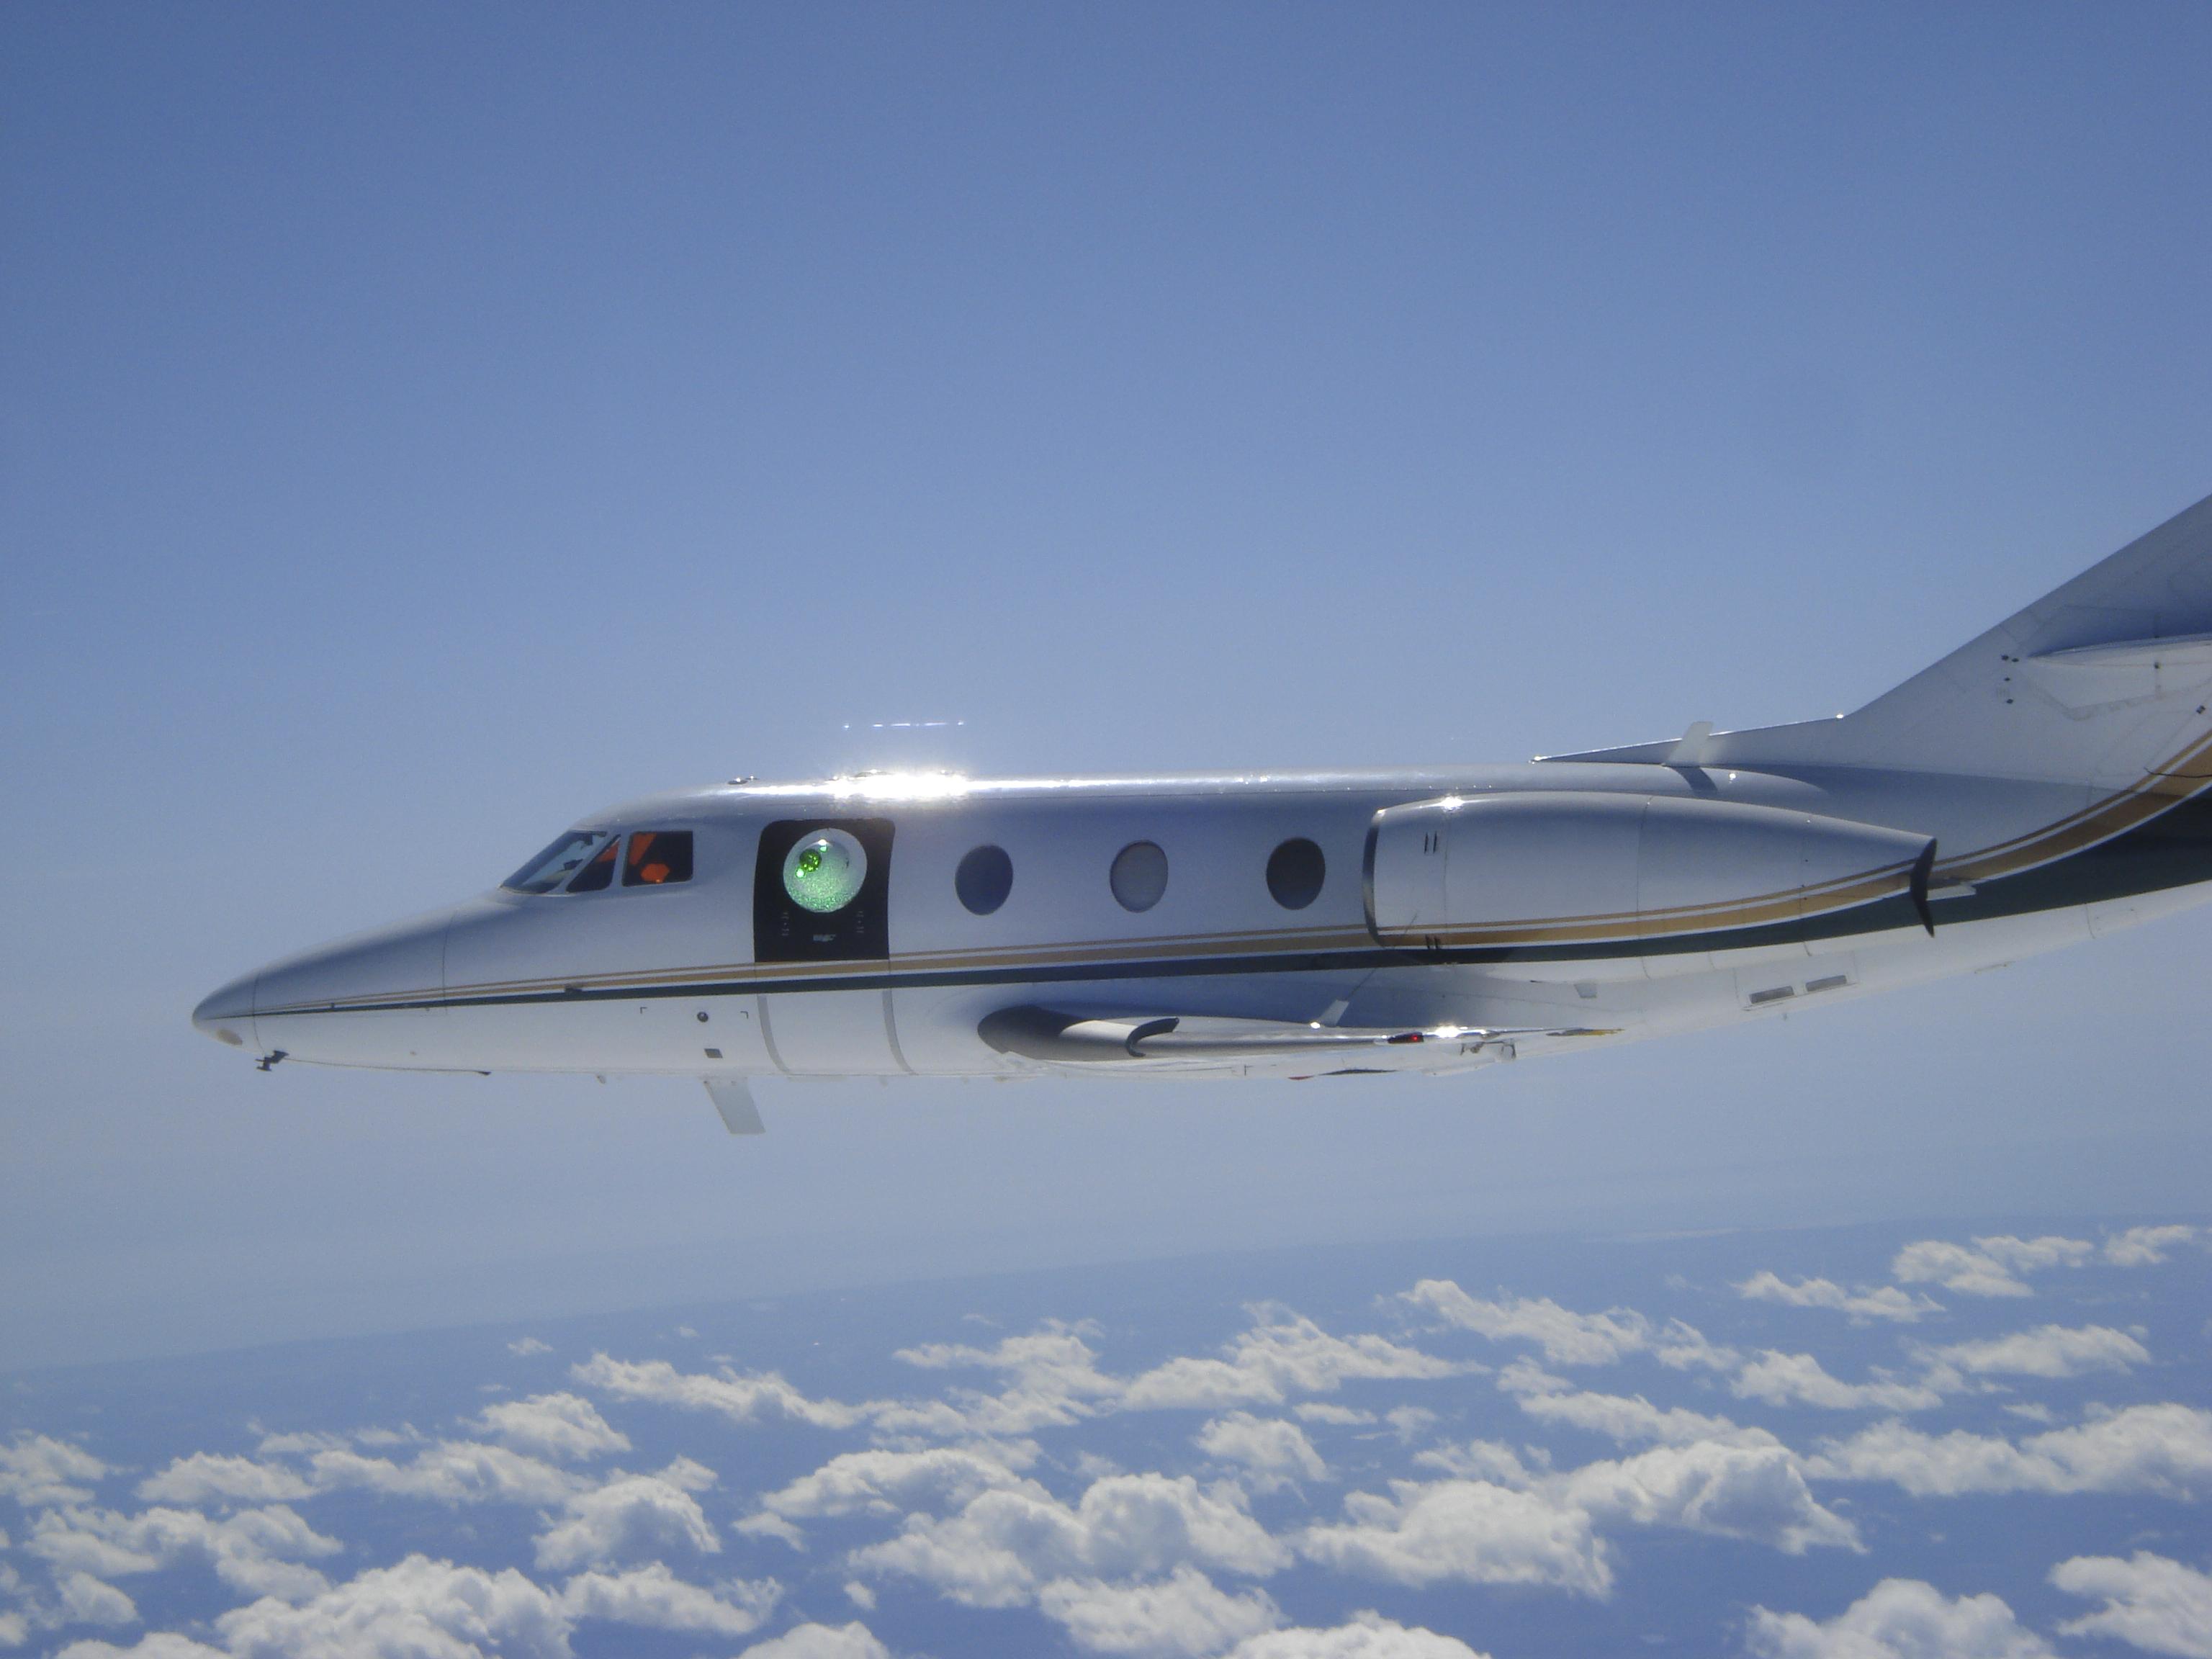 Lockheed Martin Conducts Flight Tests Of Aircraft Laser